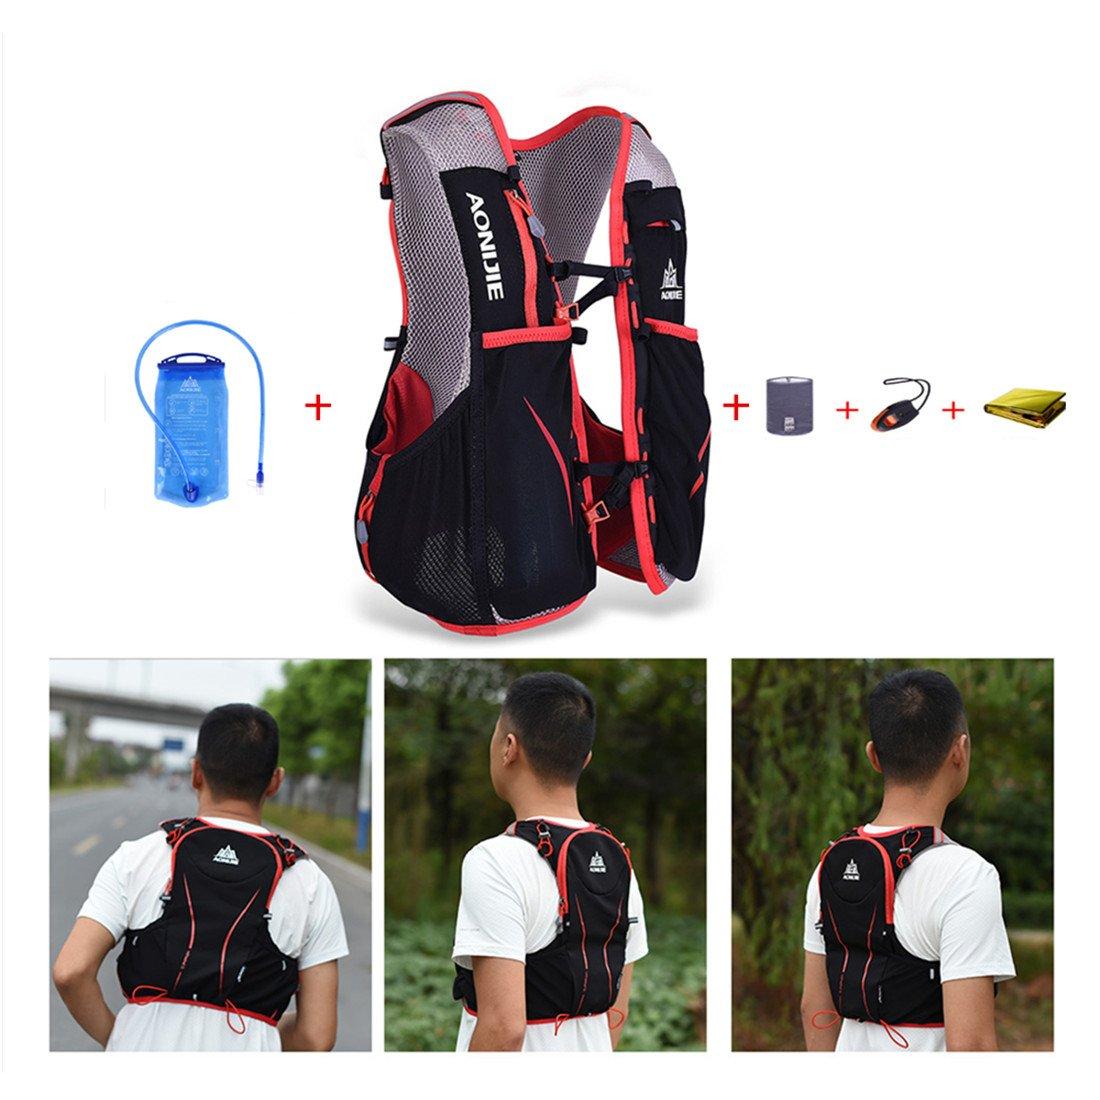 AONIJIE L bolsas de mochila de nailon impermeable para maratón ciclismo running